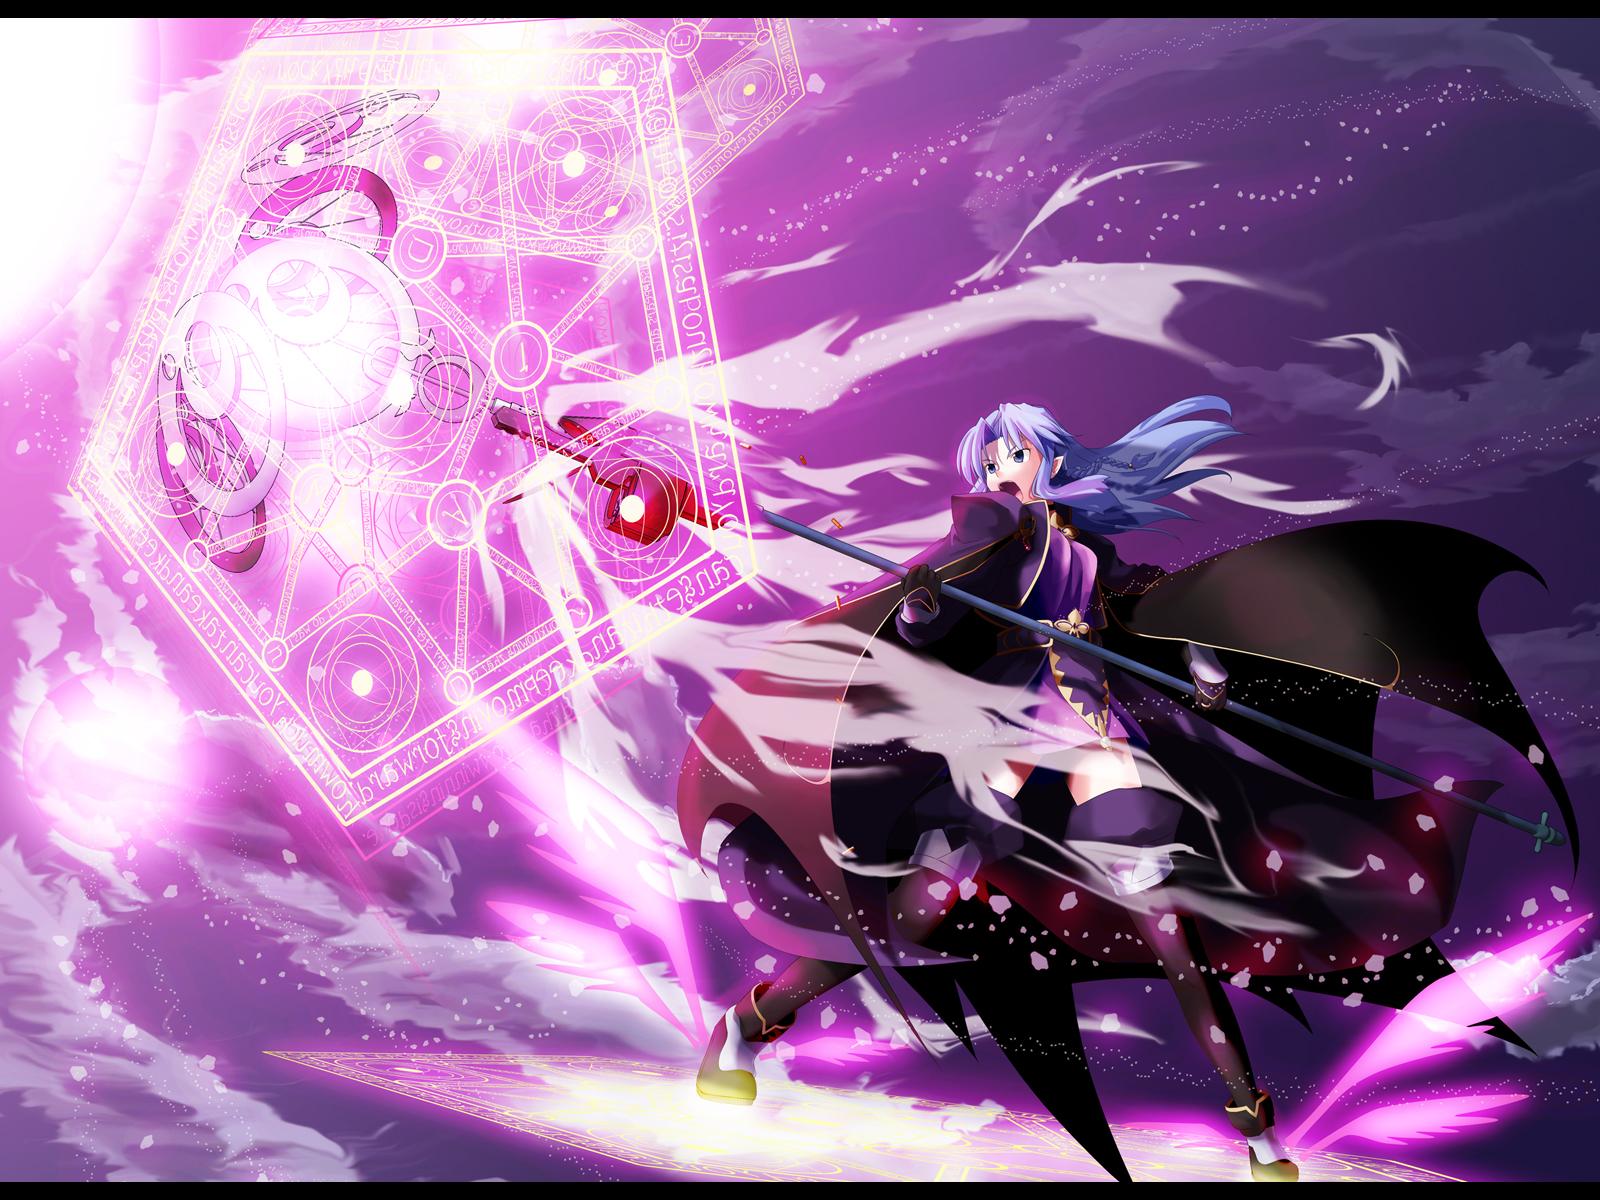 black_eyes cape fate_(series) fate/stay_night gloves long_hair magic medea_(fate) mihane pointed_ears purple_hair staff thighhighs weapon